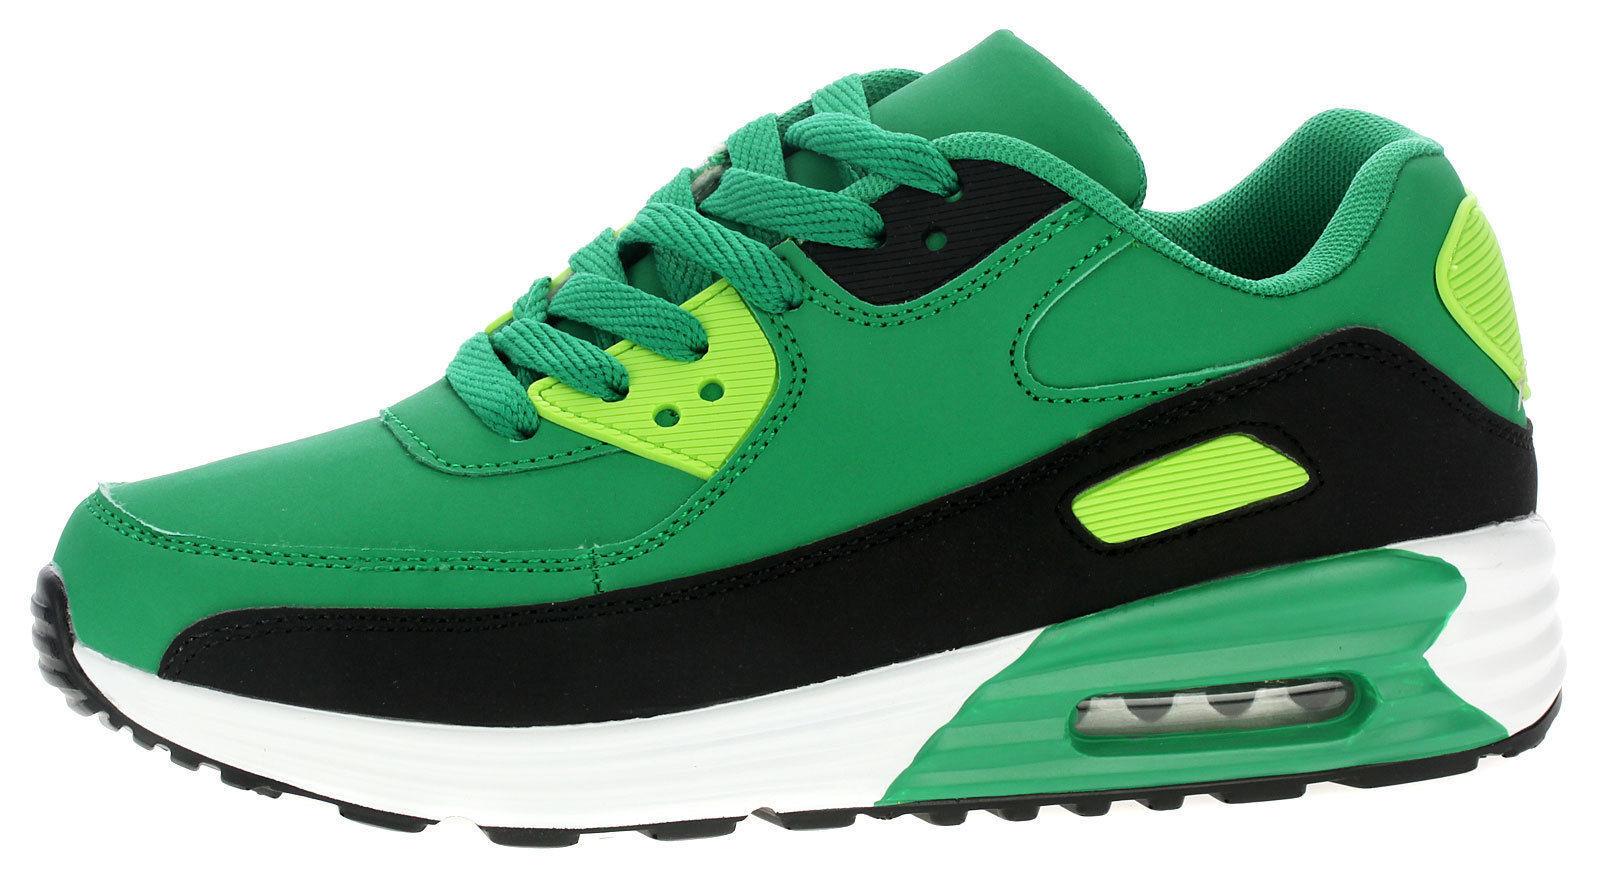 30. schwarz-grün